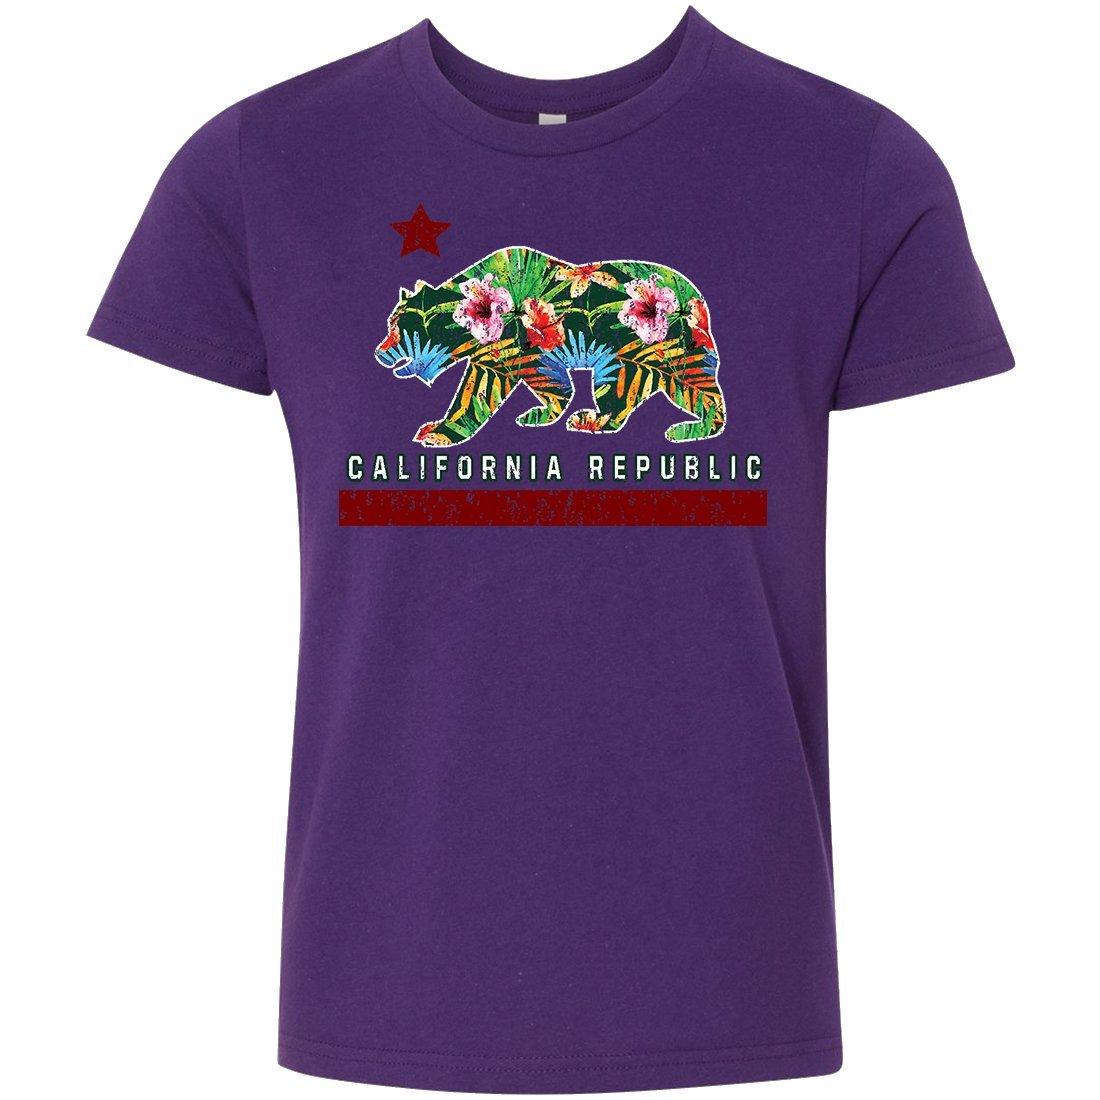 California Tropical Paradise Flag Asst Colors Youth T-Shirt//tee